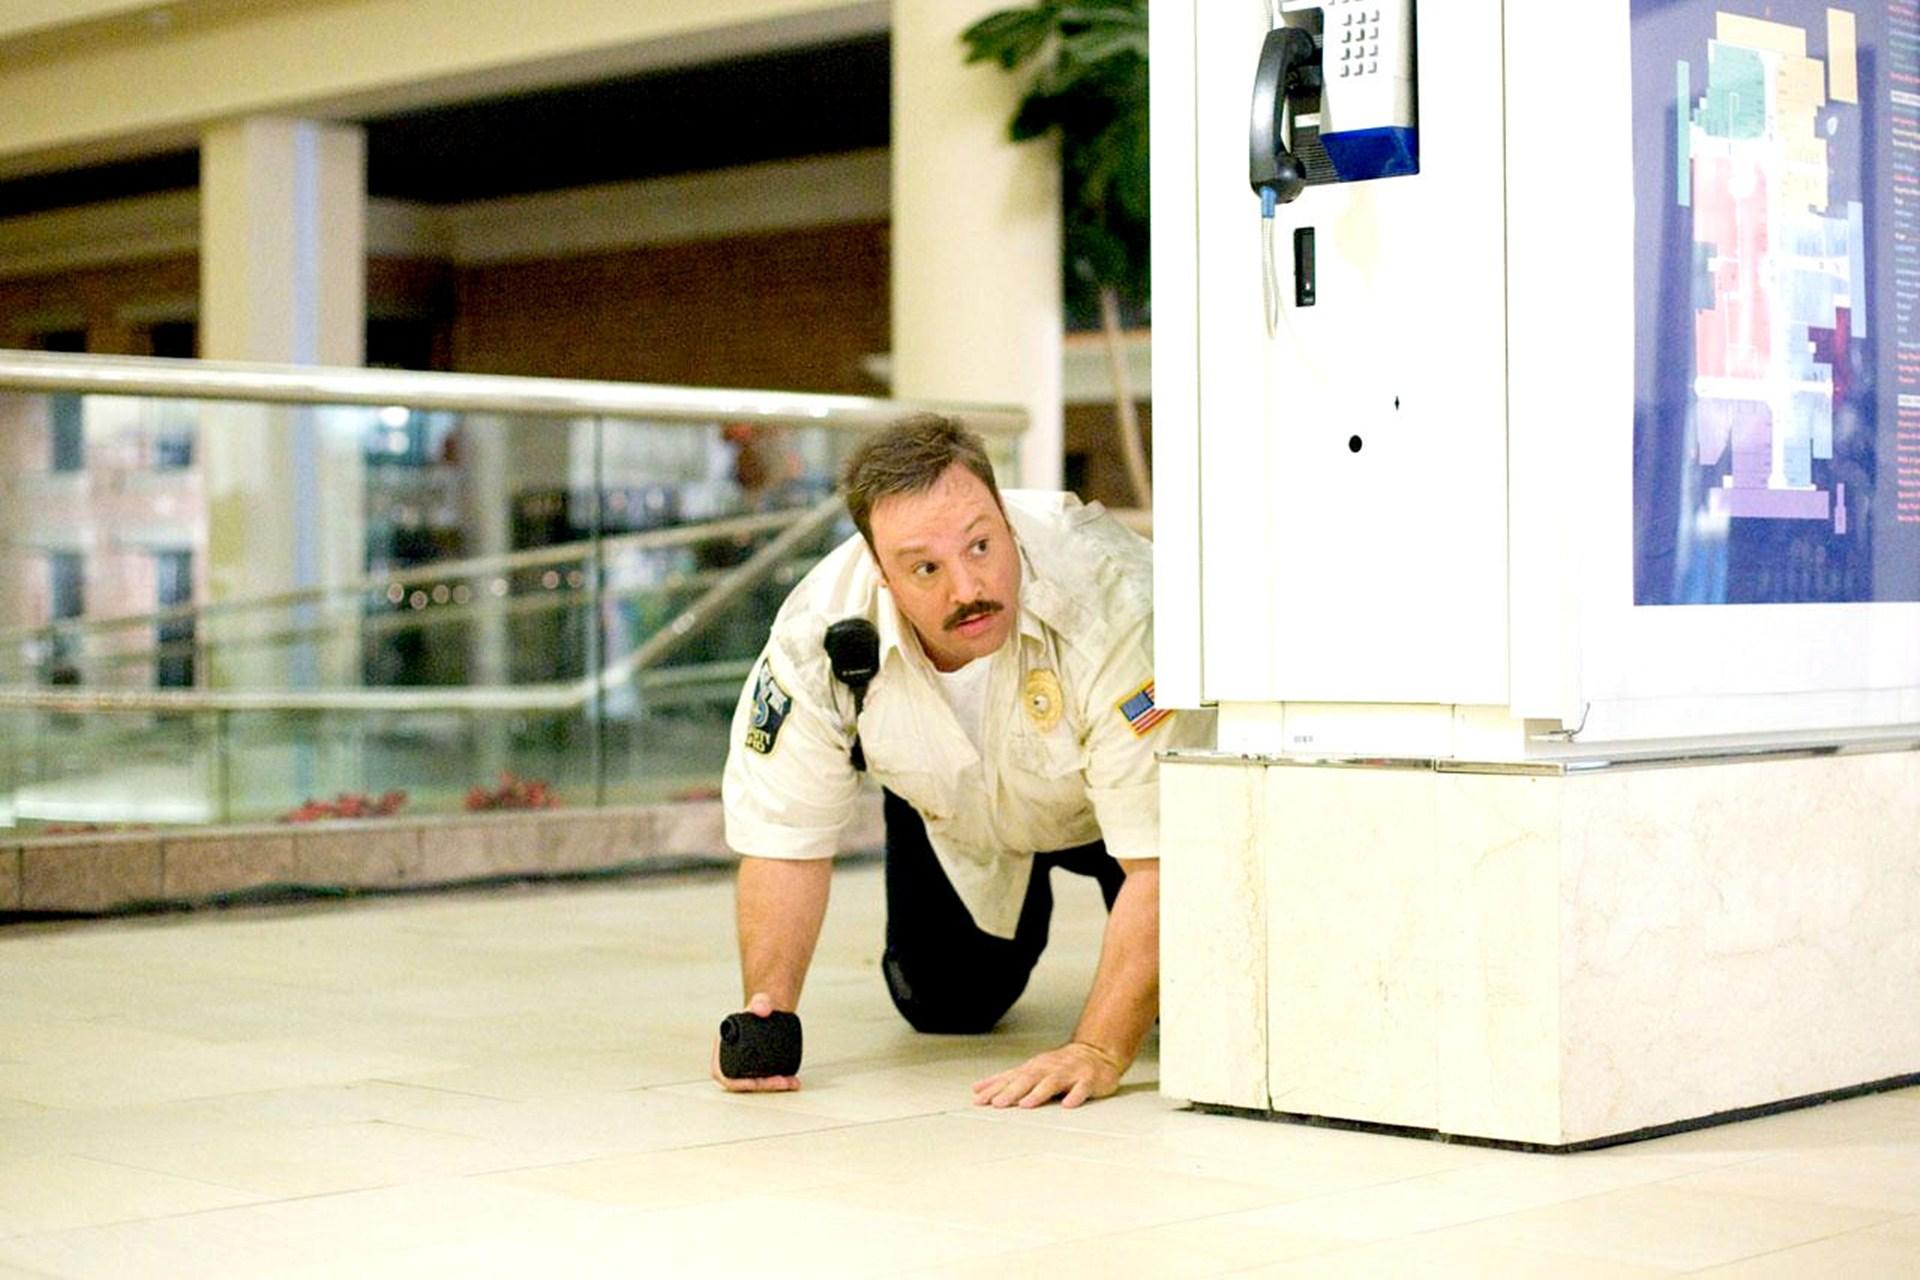 paul blart mall cop 2 failed critics